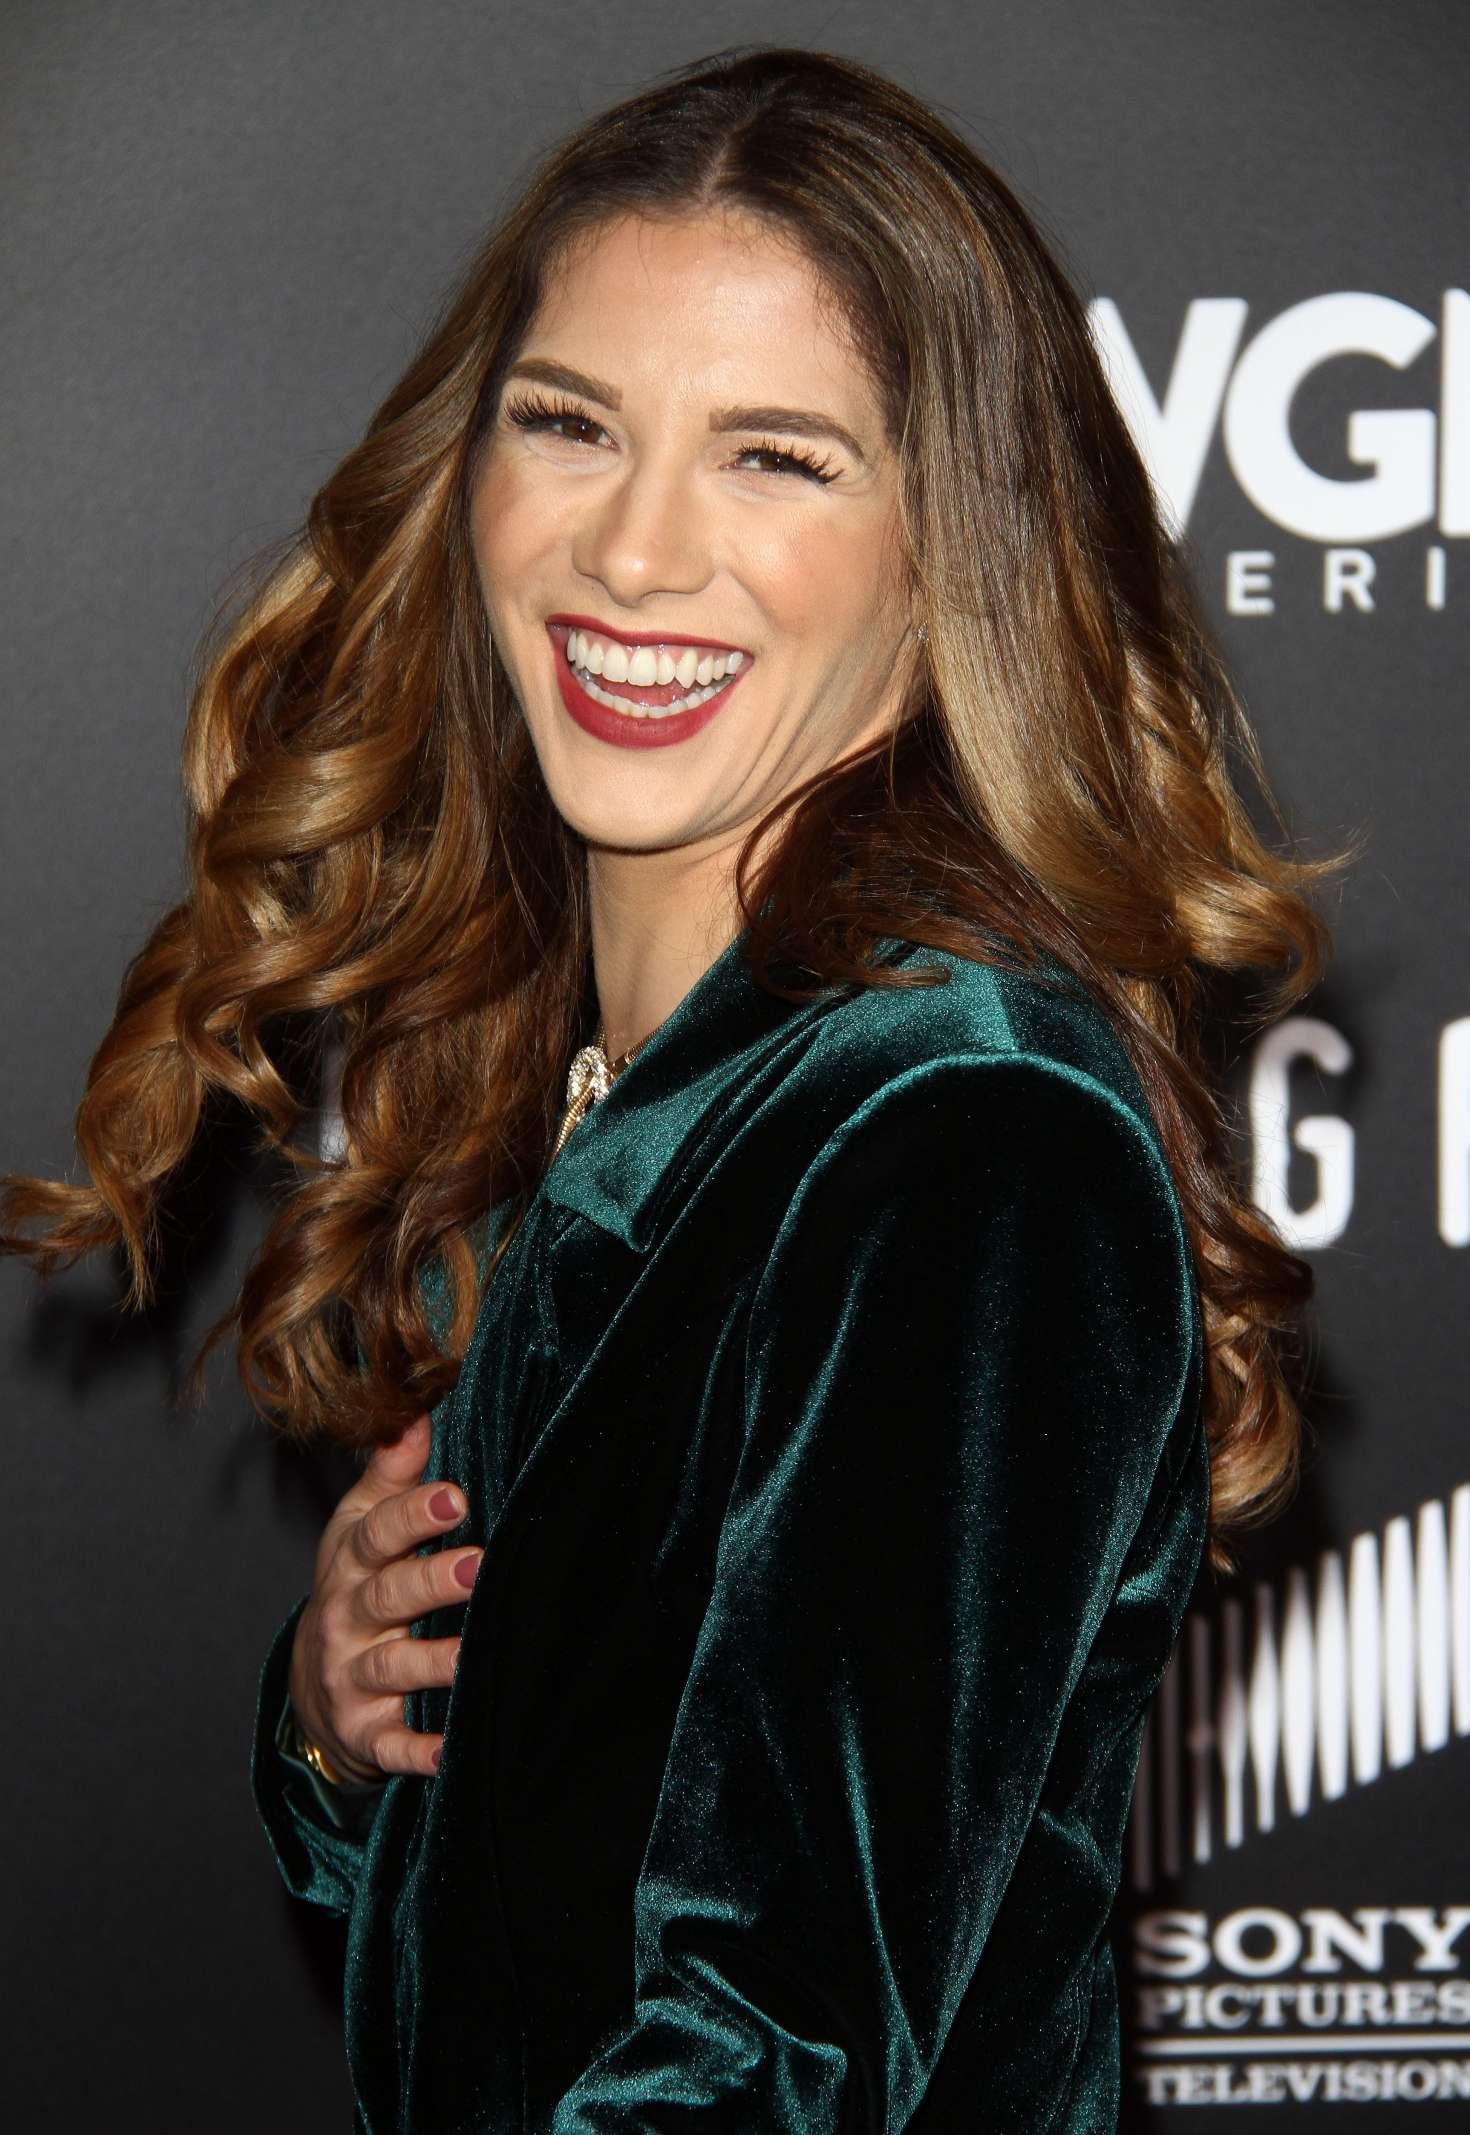 Allison holker at underground tv series season 2 premiere in los angeles nudes (45 photo)